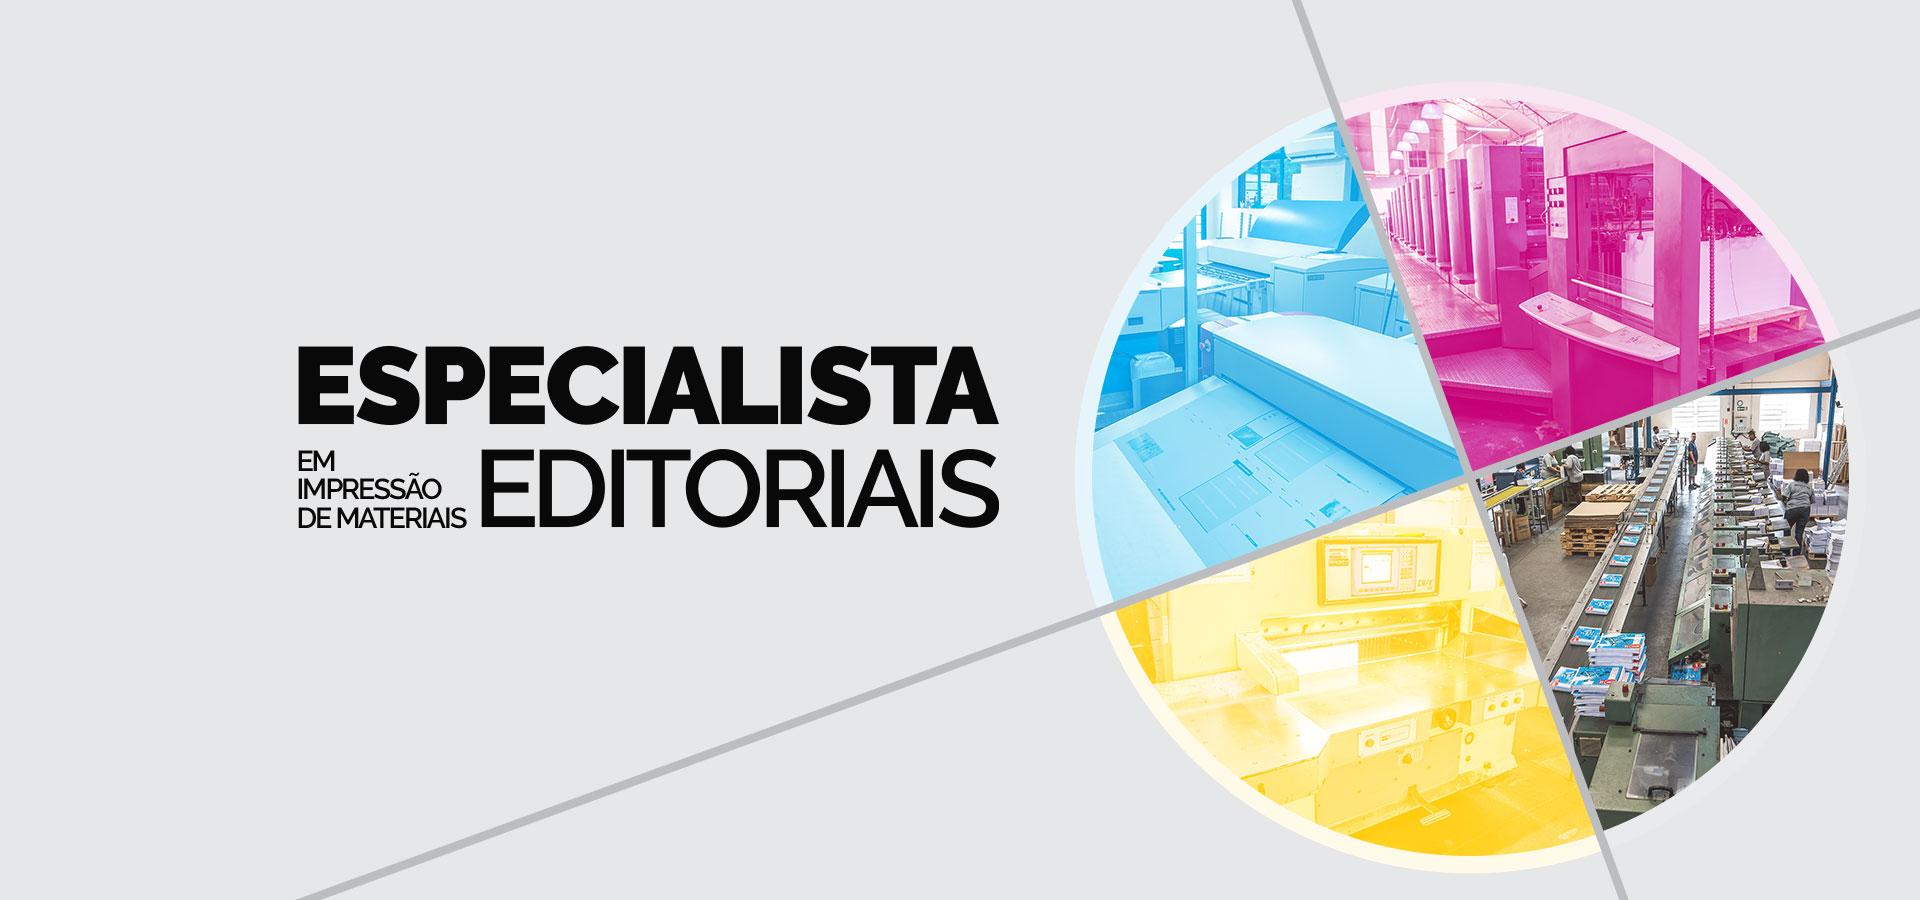 Especialista Editoriais